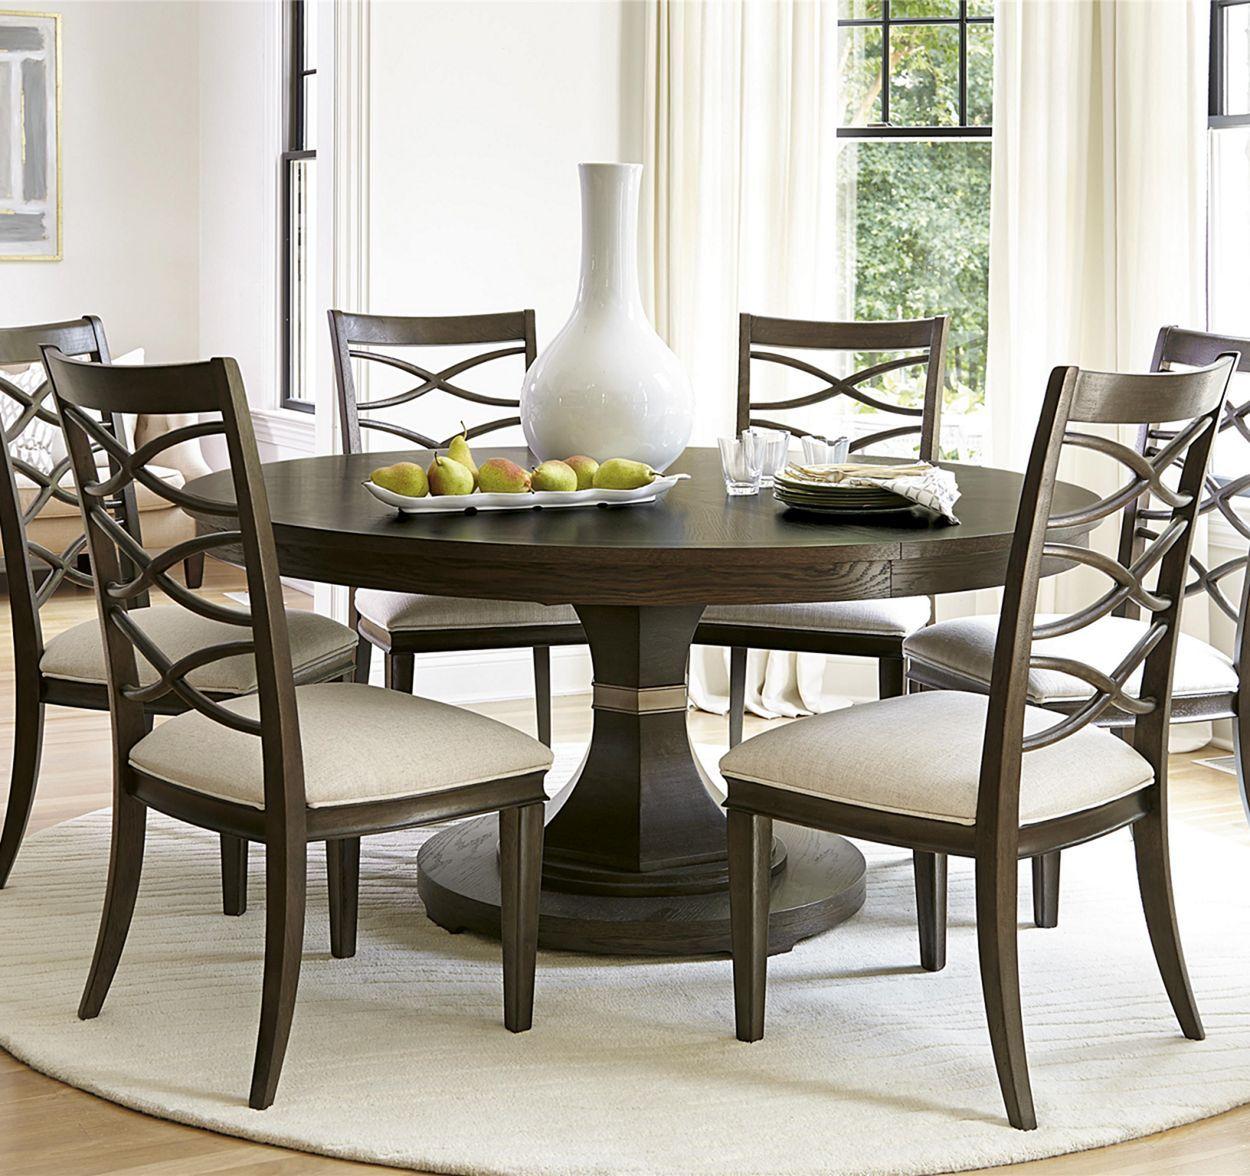 30 Wonderful Dining Table Set Up Ideas For Enjoy Your Dinner Round Dining Room Round Dining Room Table Round Dining Table Modern